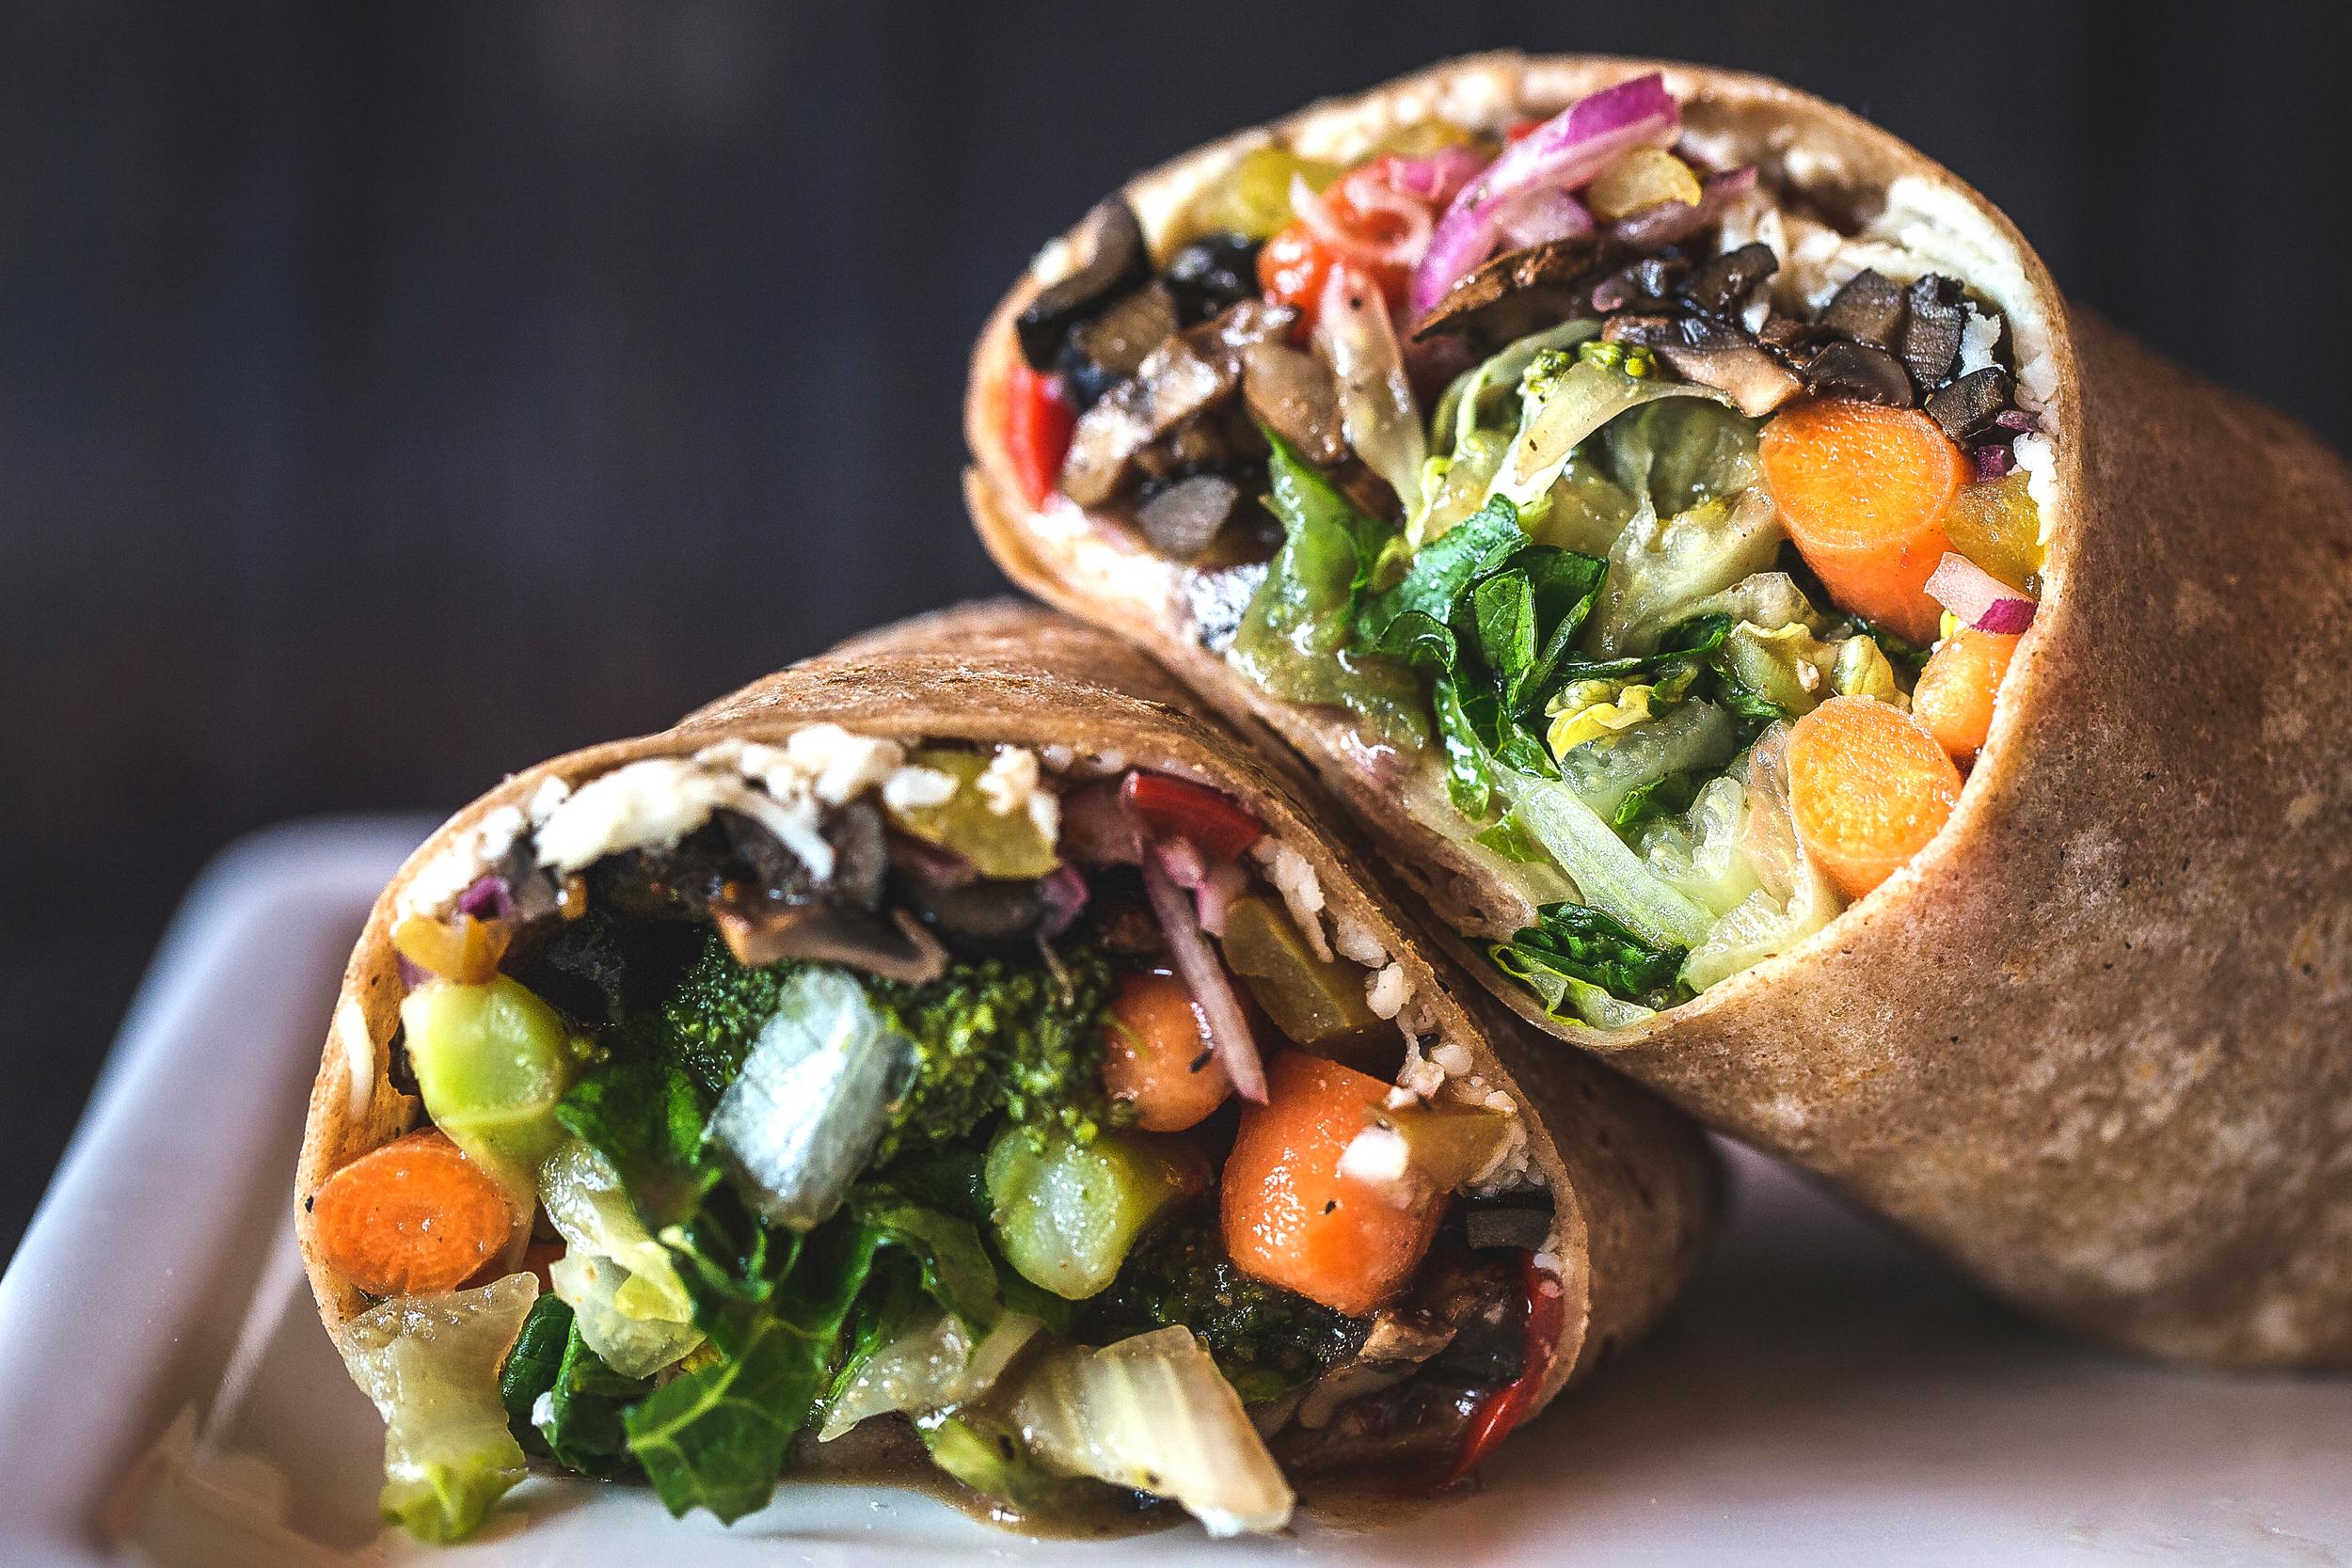 vegetarianwrap.jpg